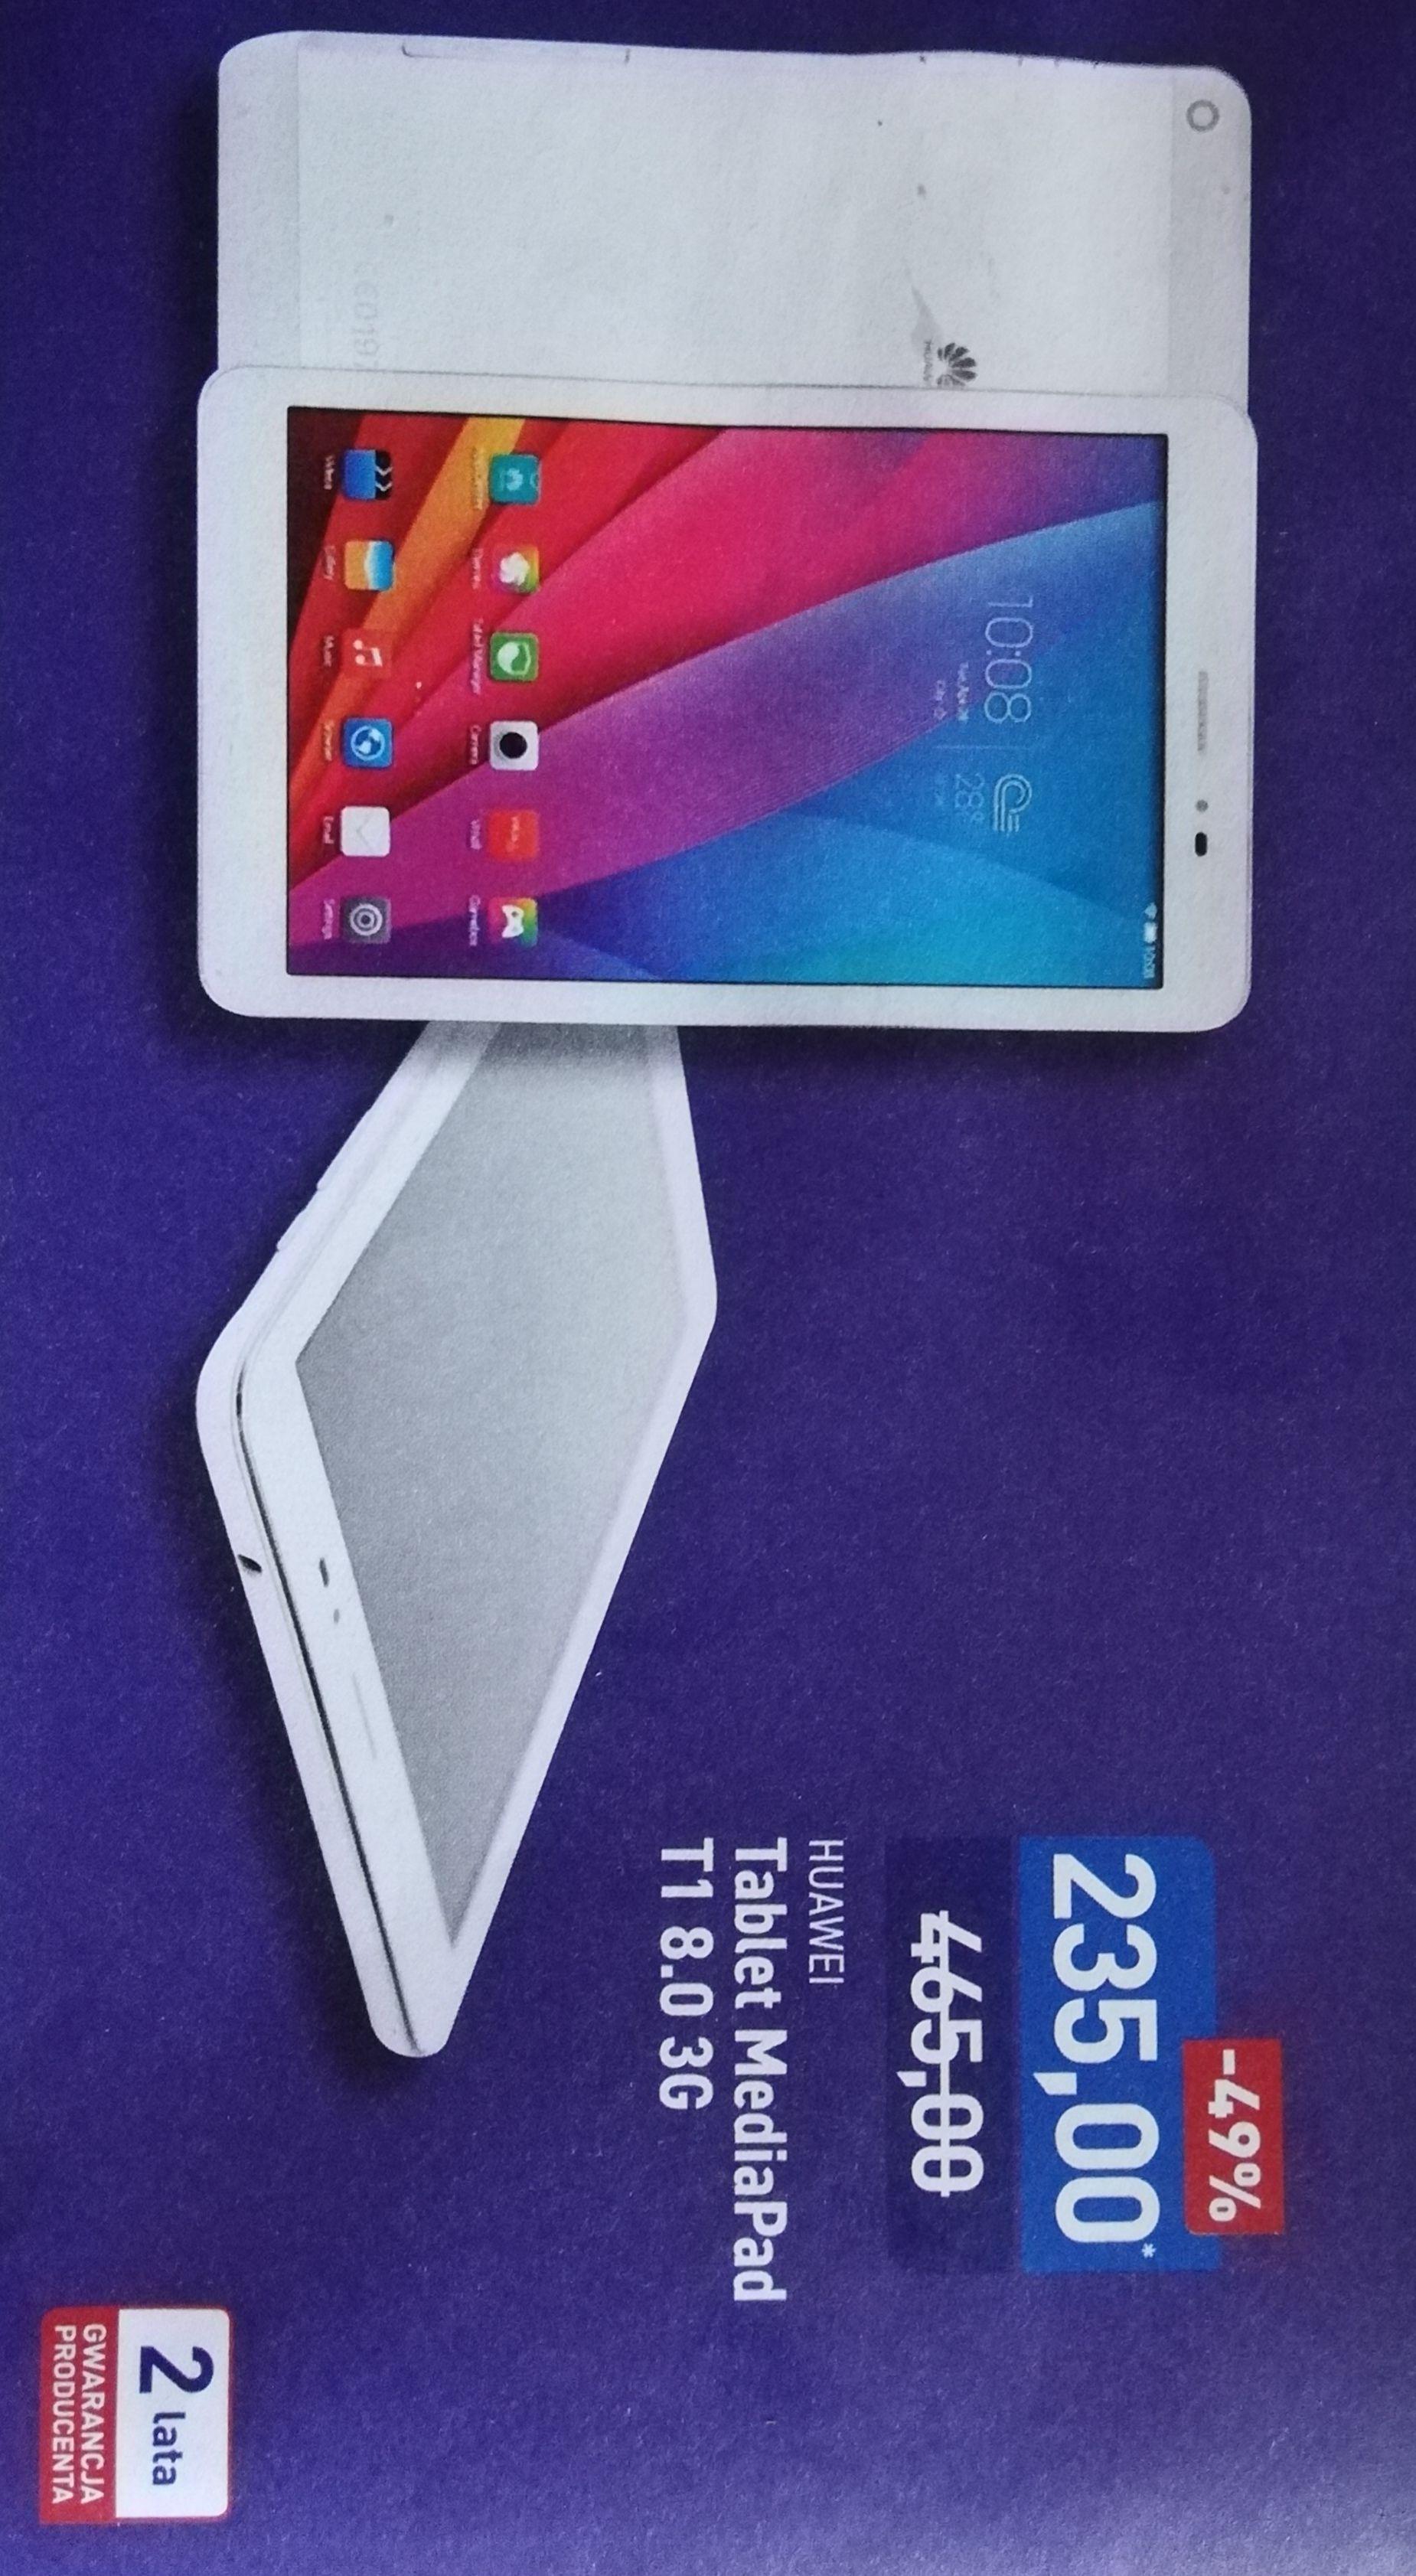 Tablet Huawei MediaPad T1 8.0 3G [ALDI]